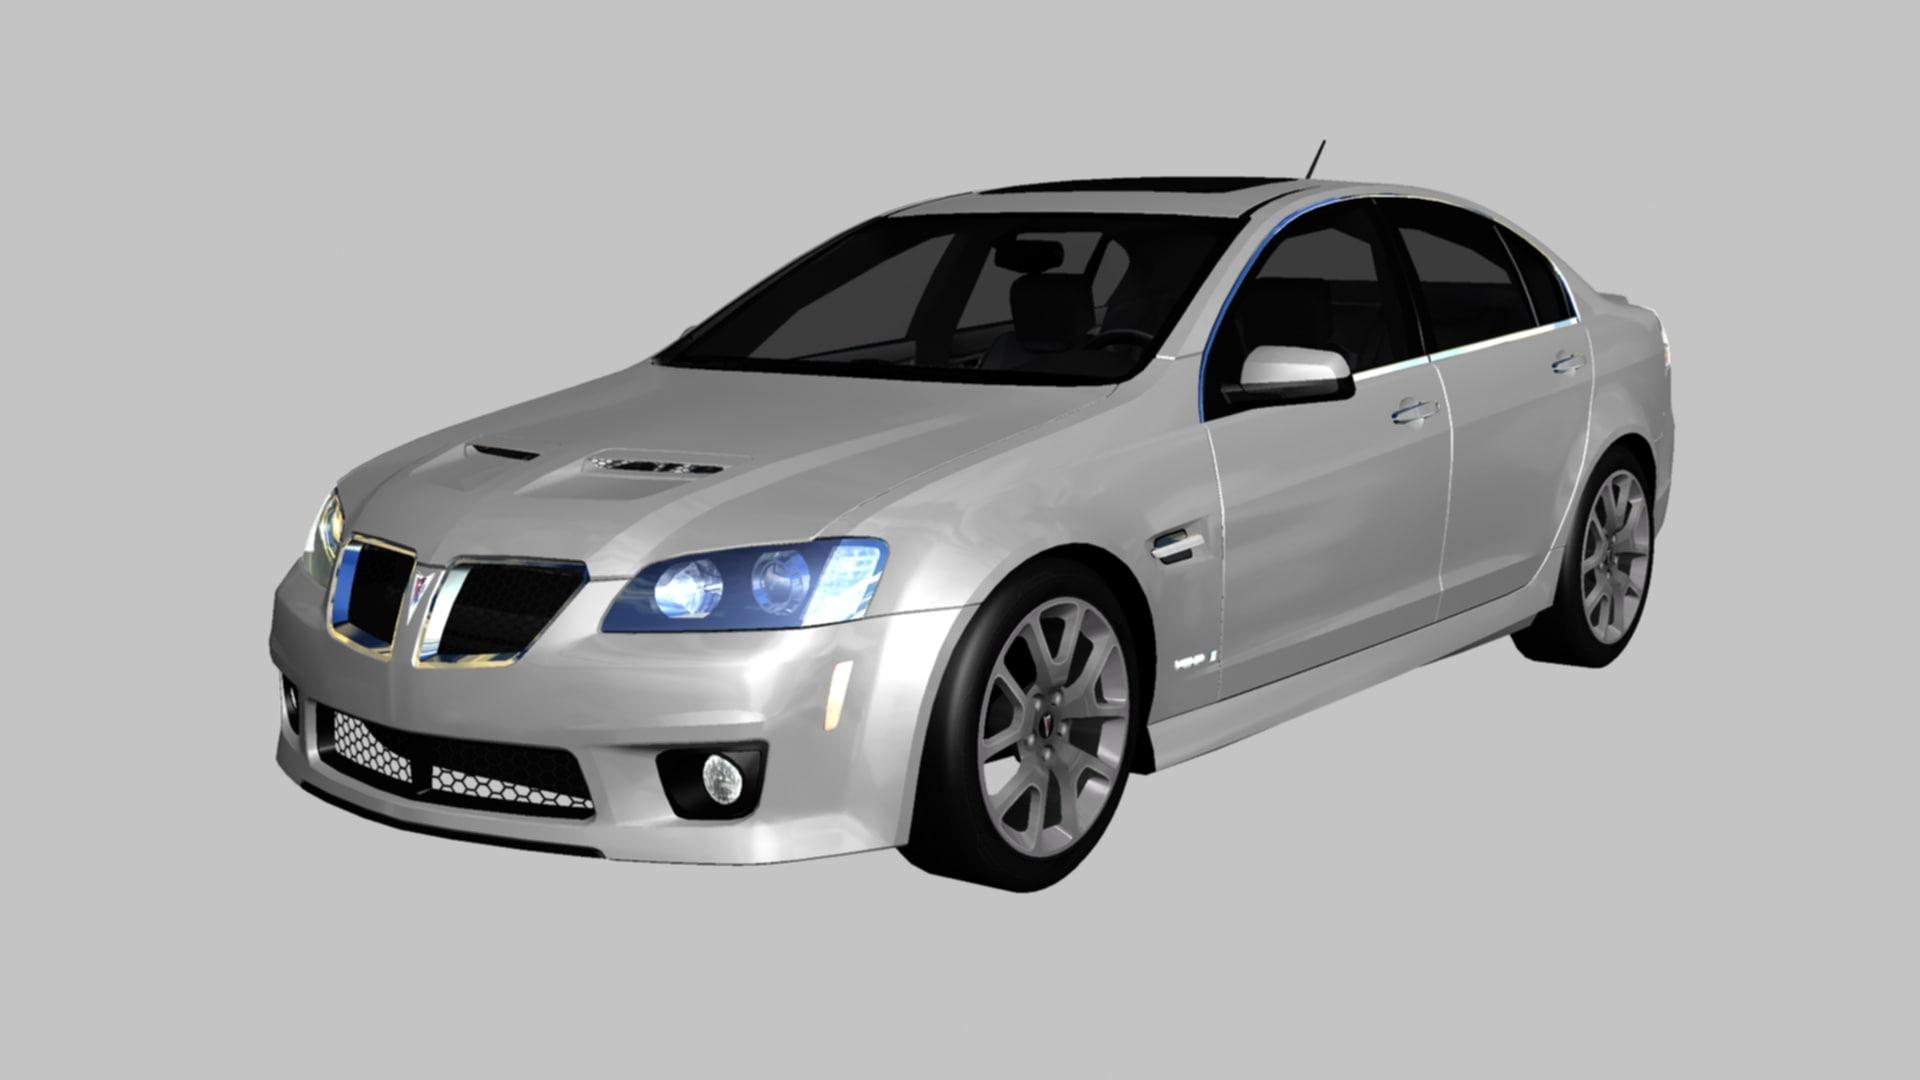 pontiac g8 2009 3D model